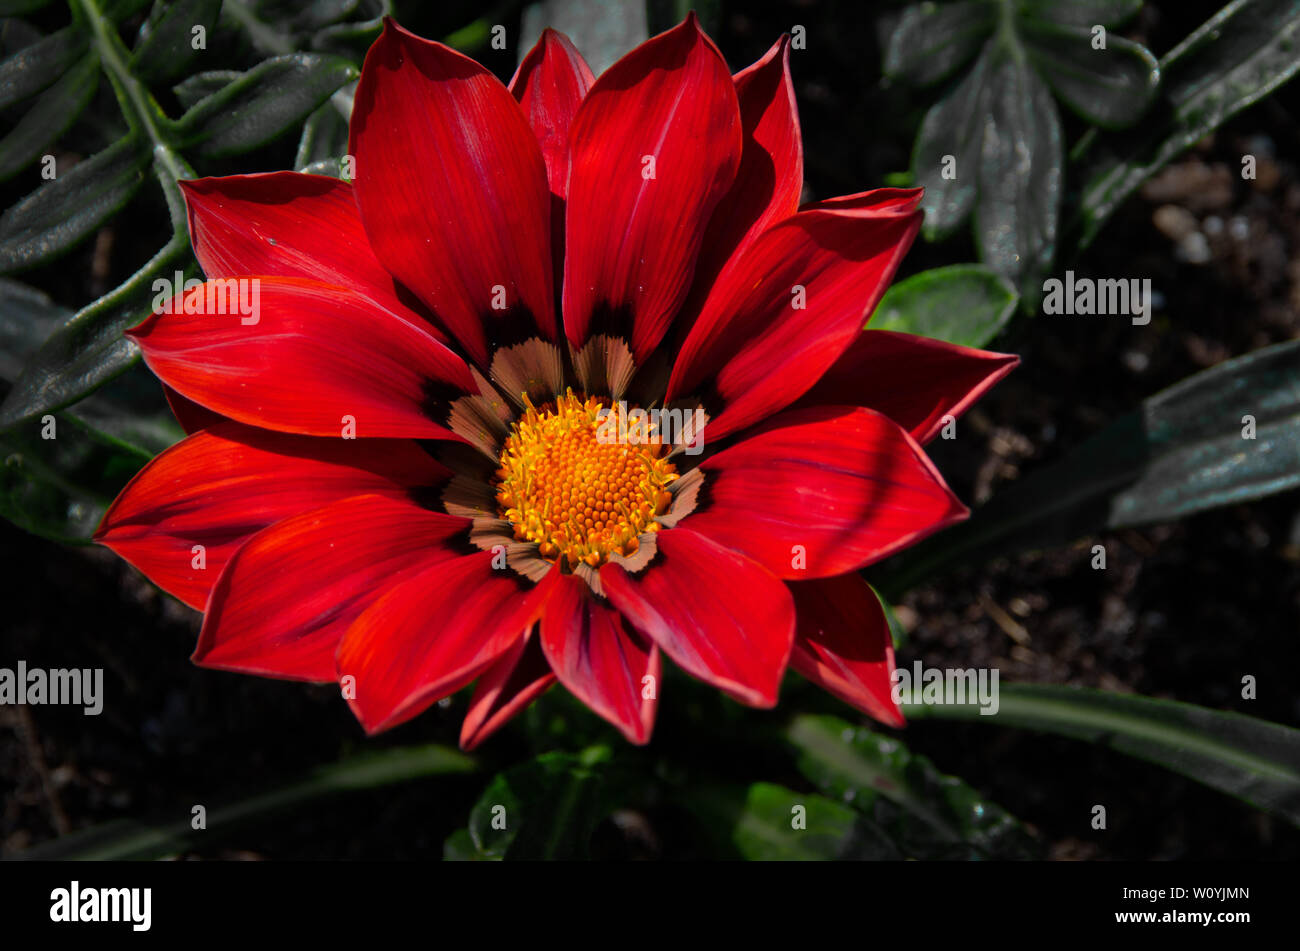 Red Gazania flower Stock Photo